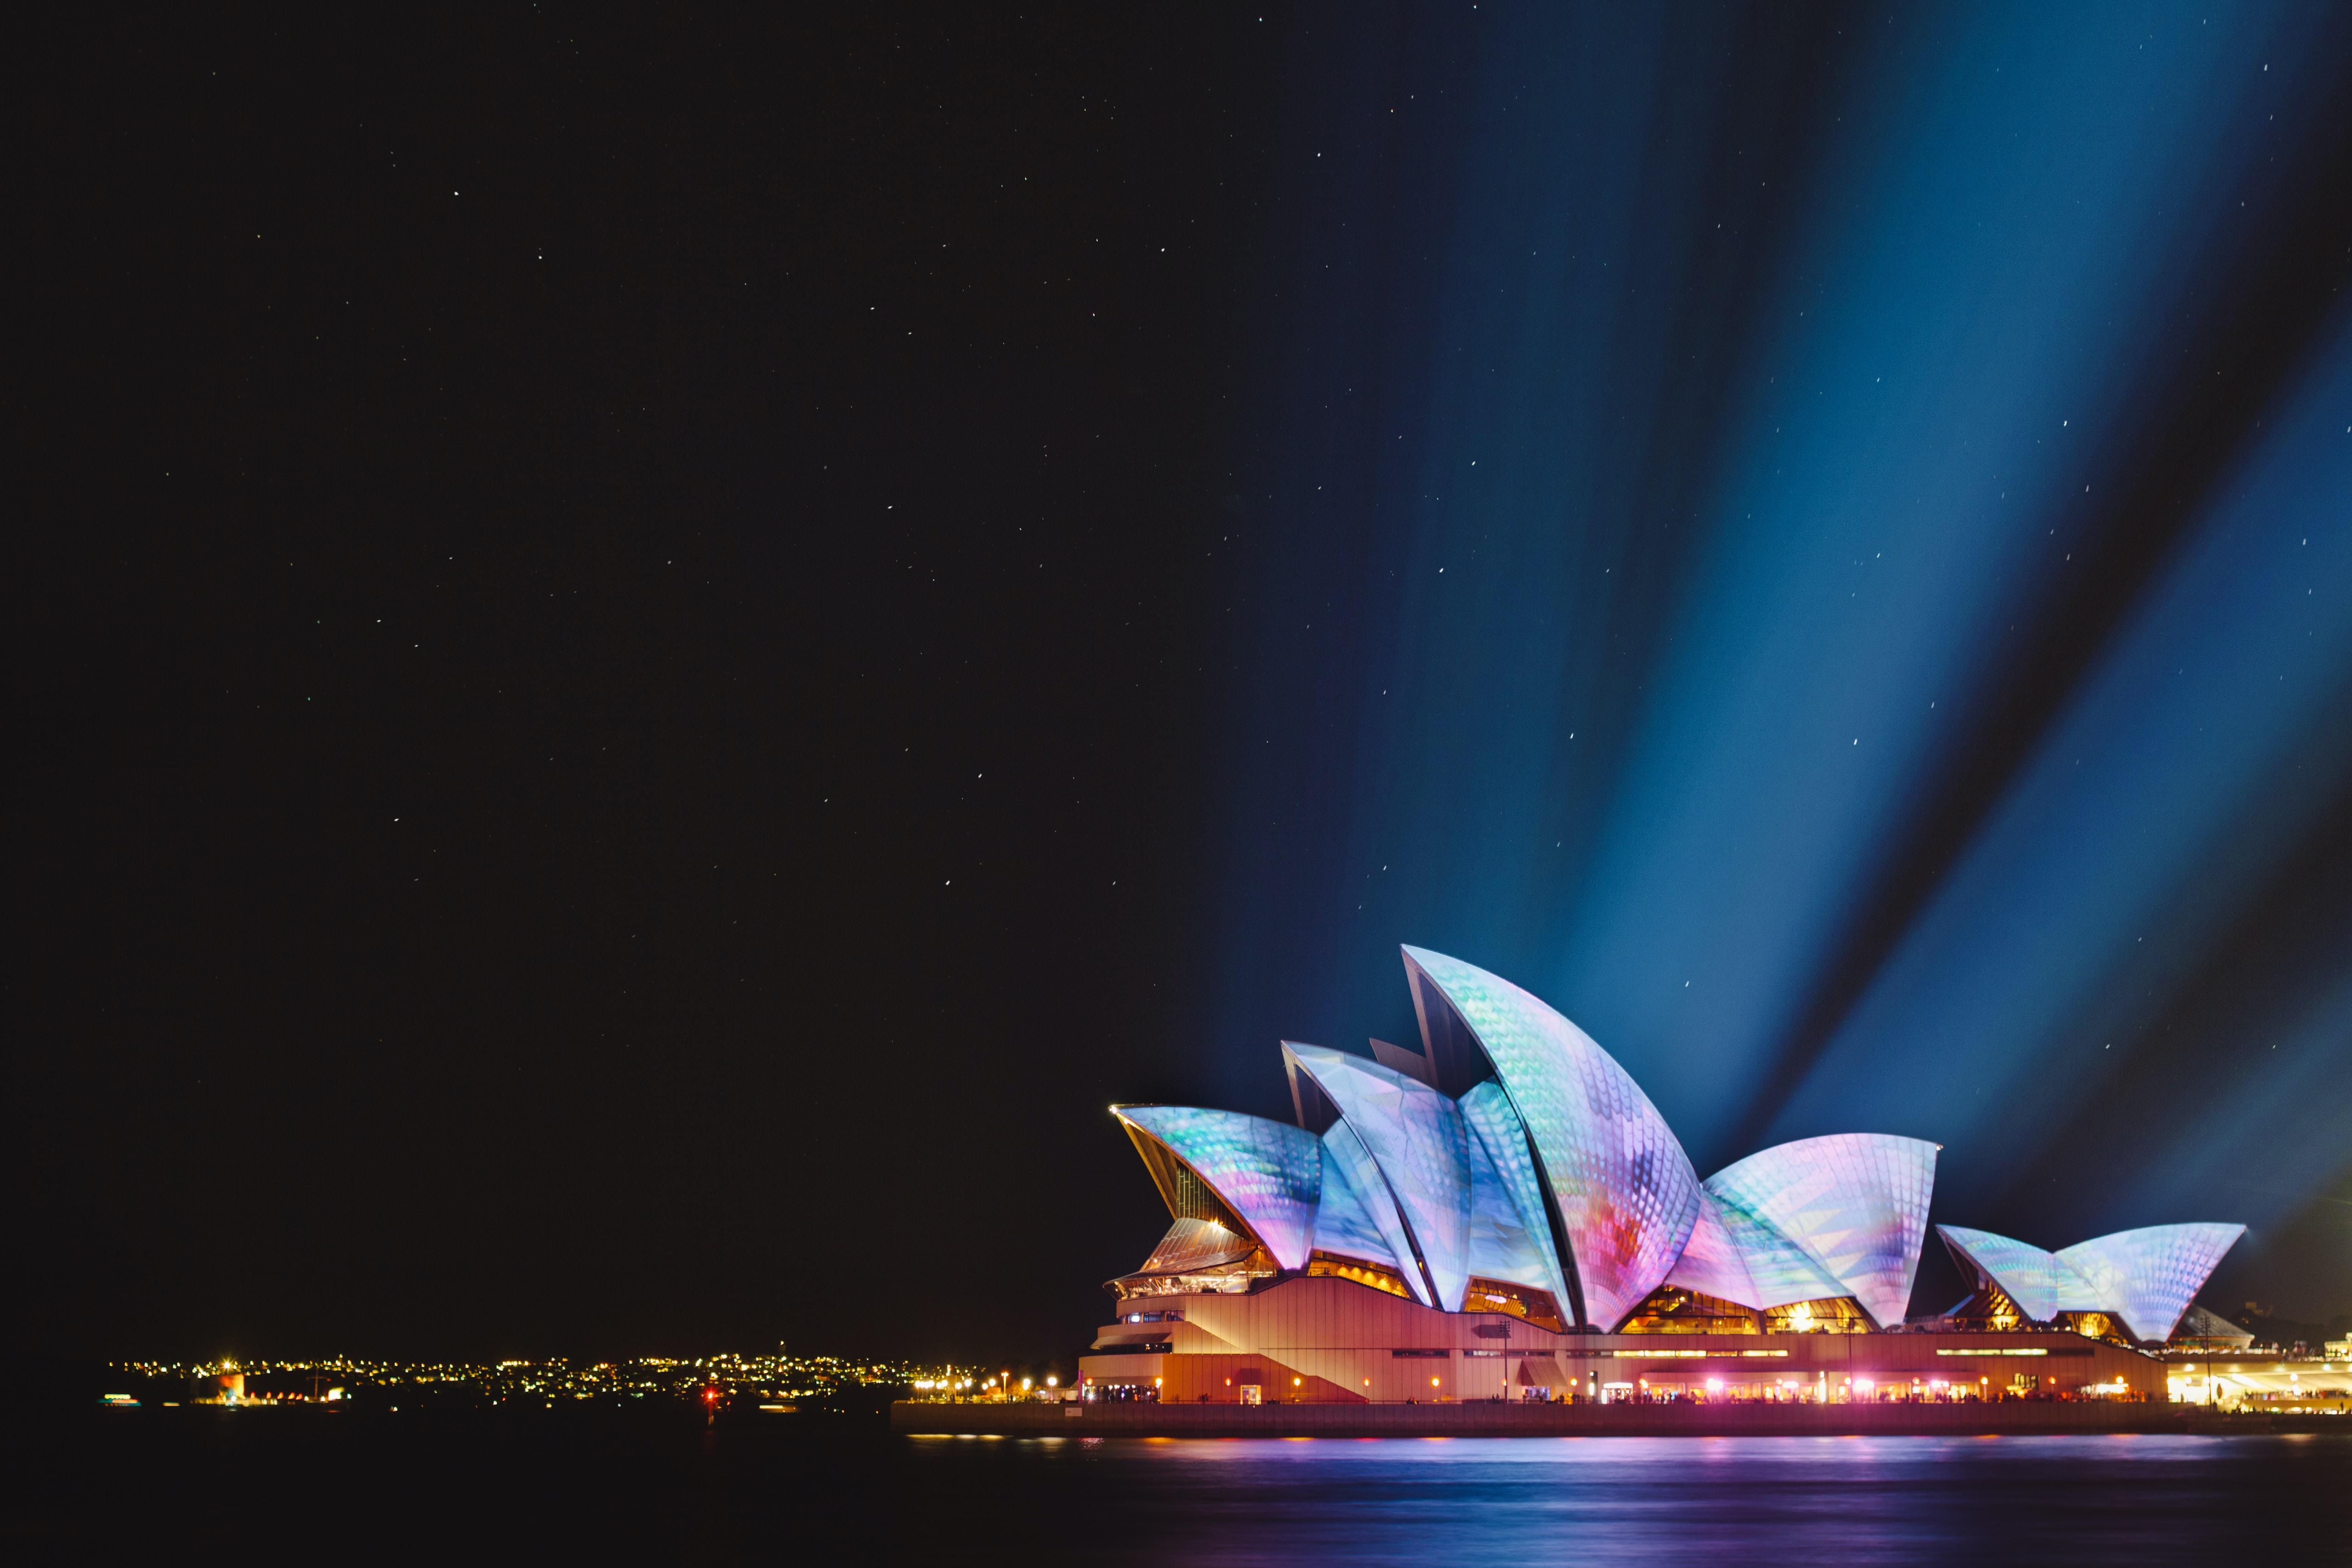 Opera House, Sydney during nighttime